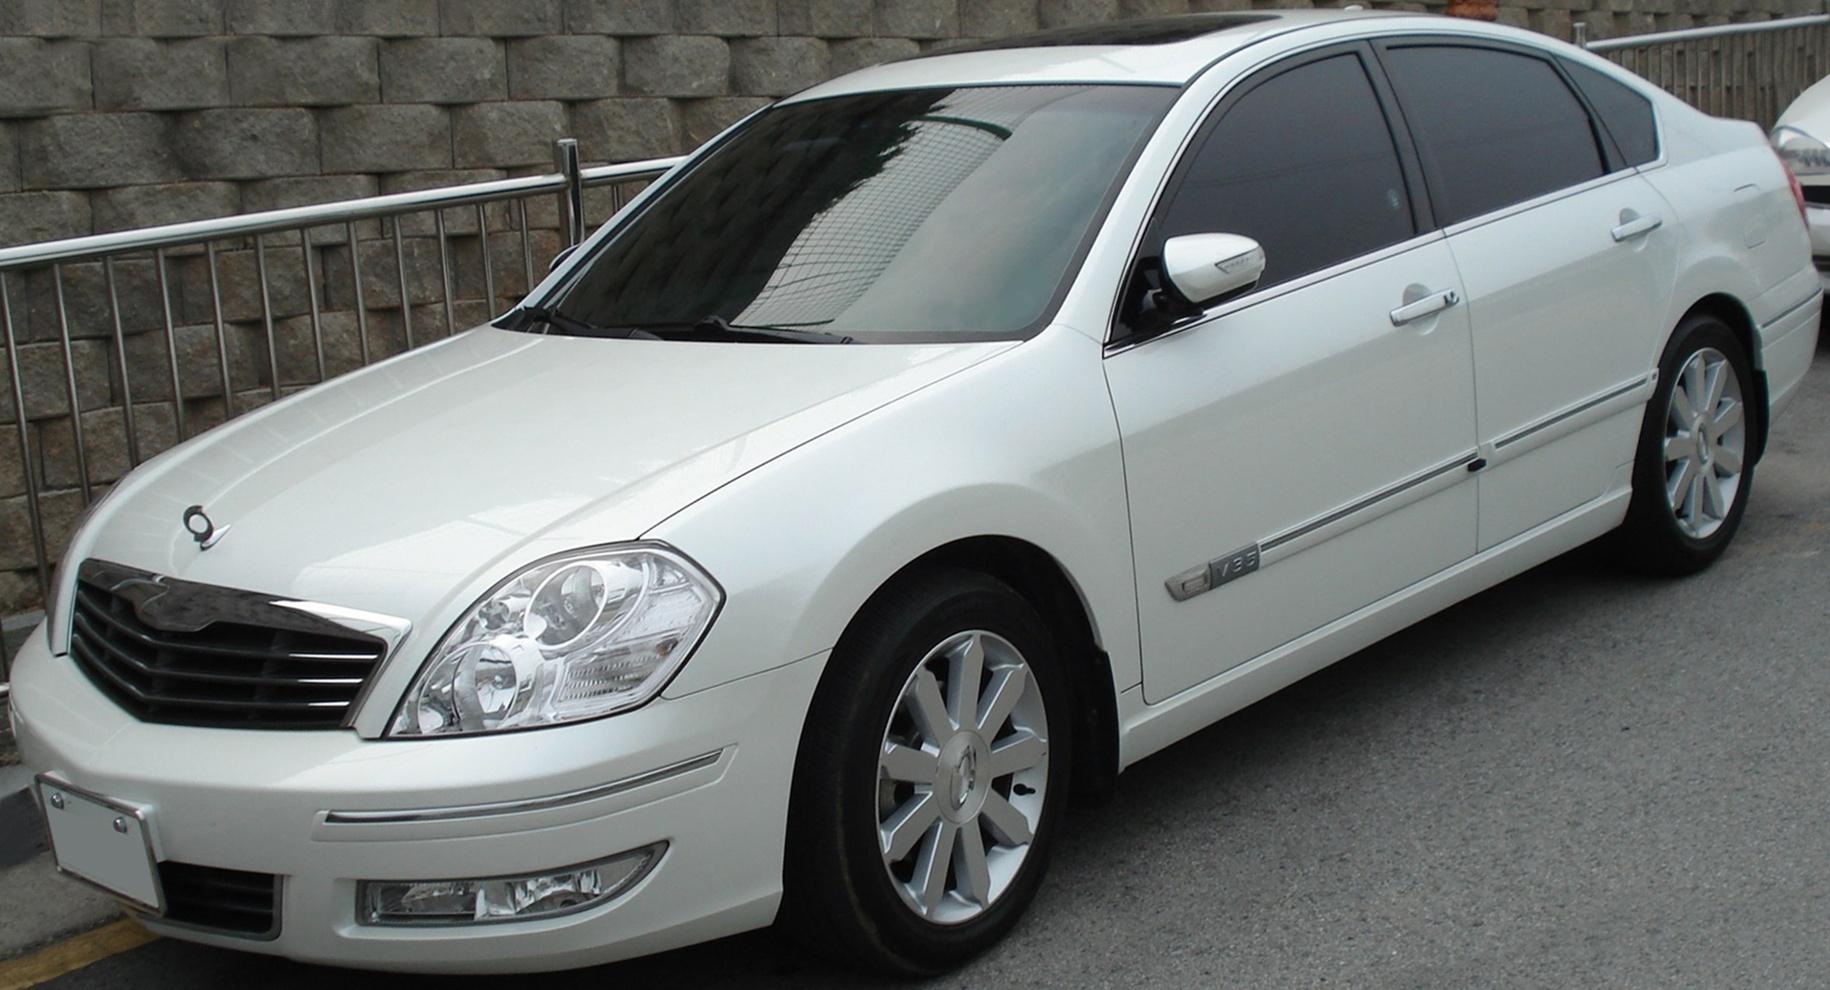 renault samson sm7 2004